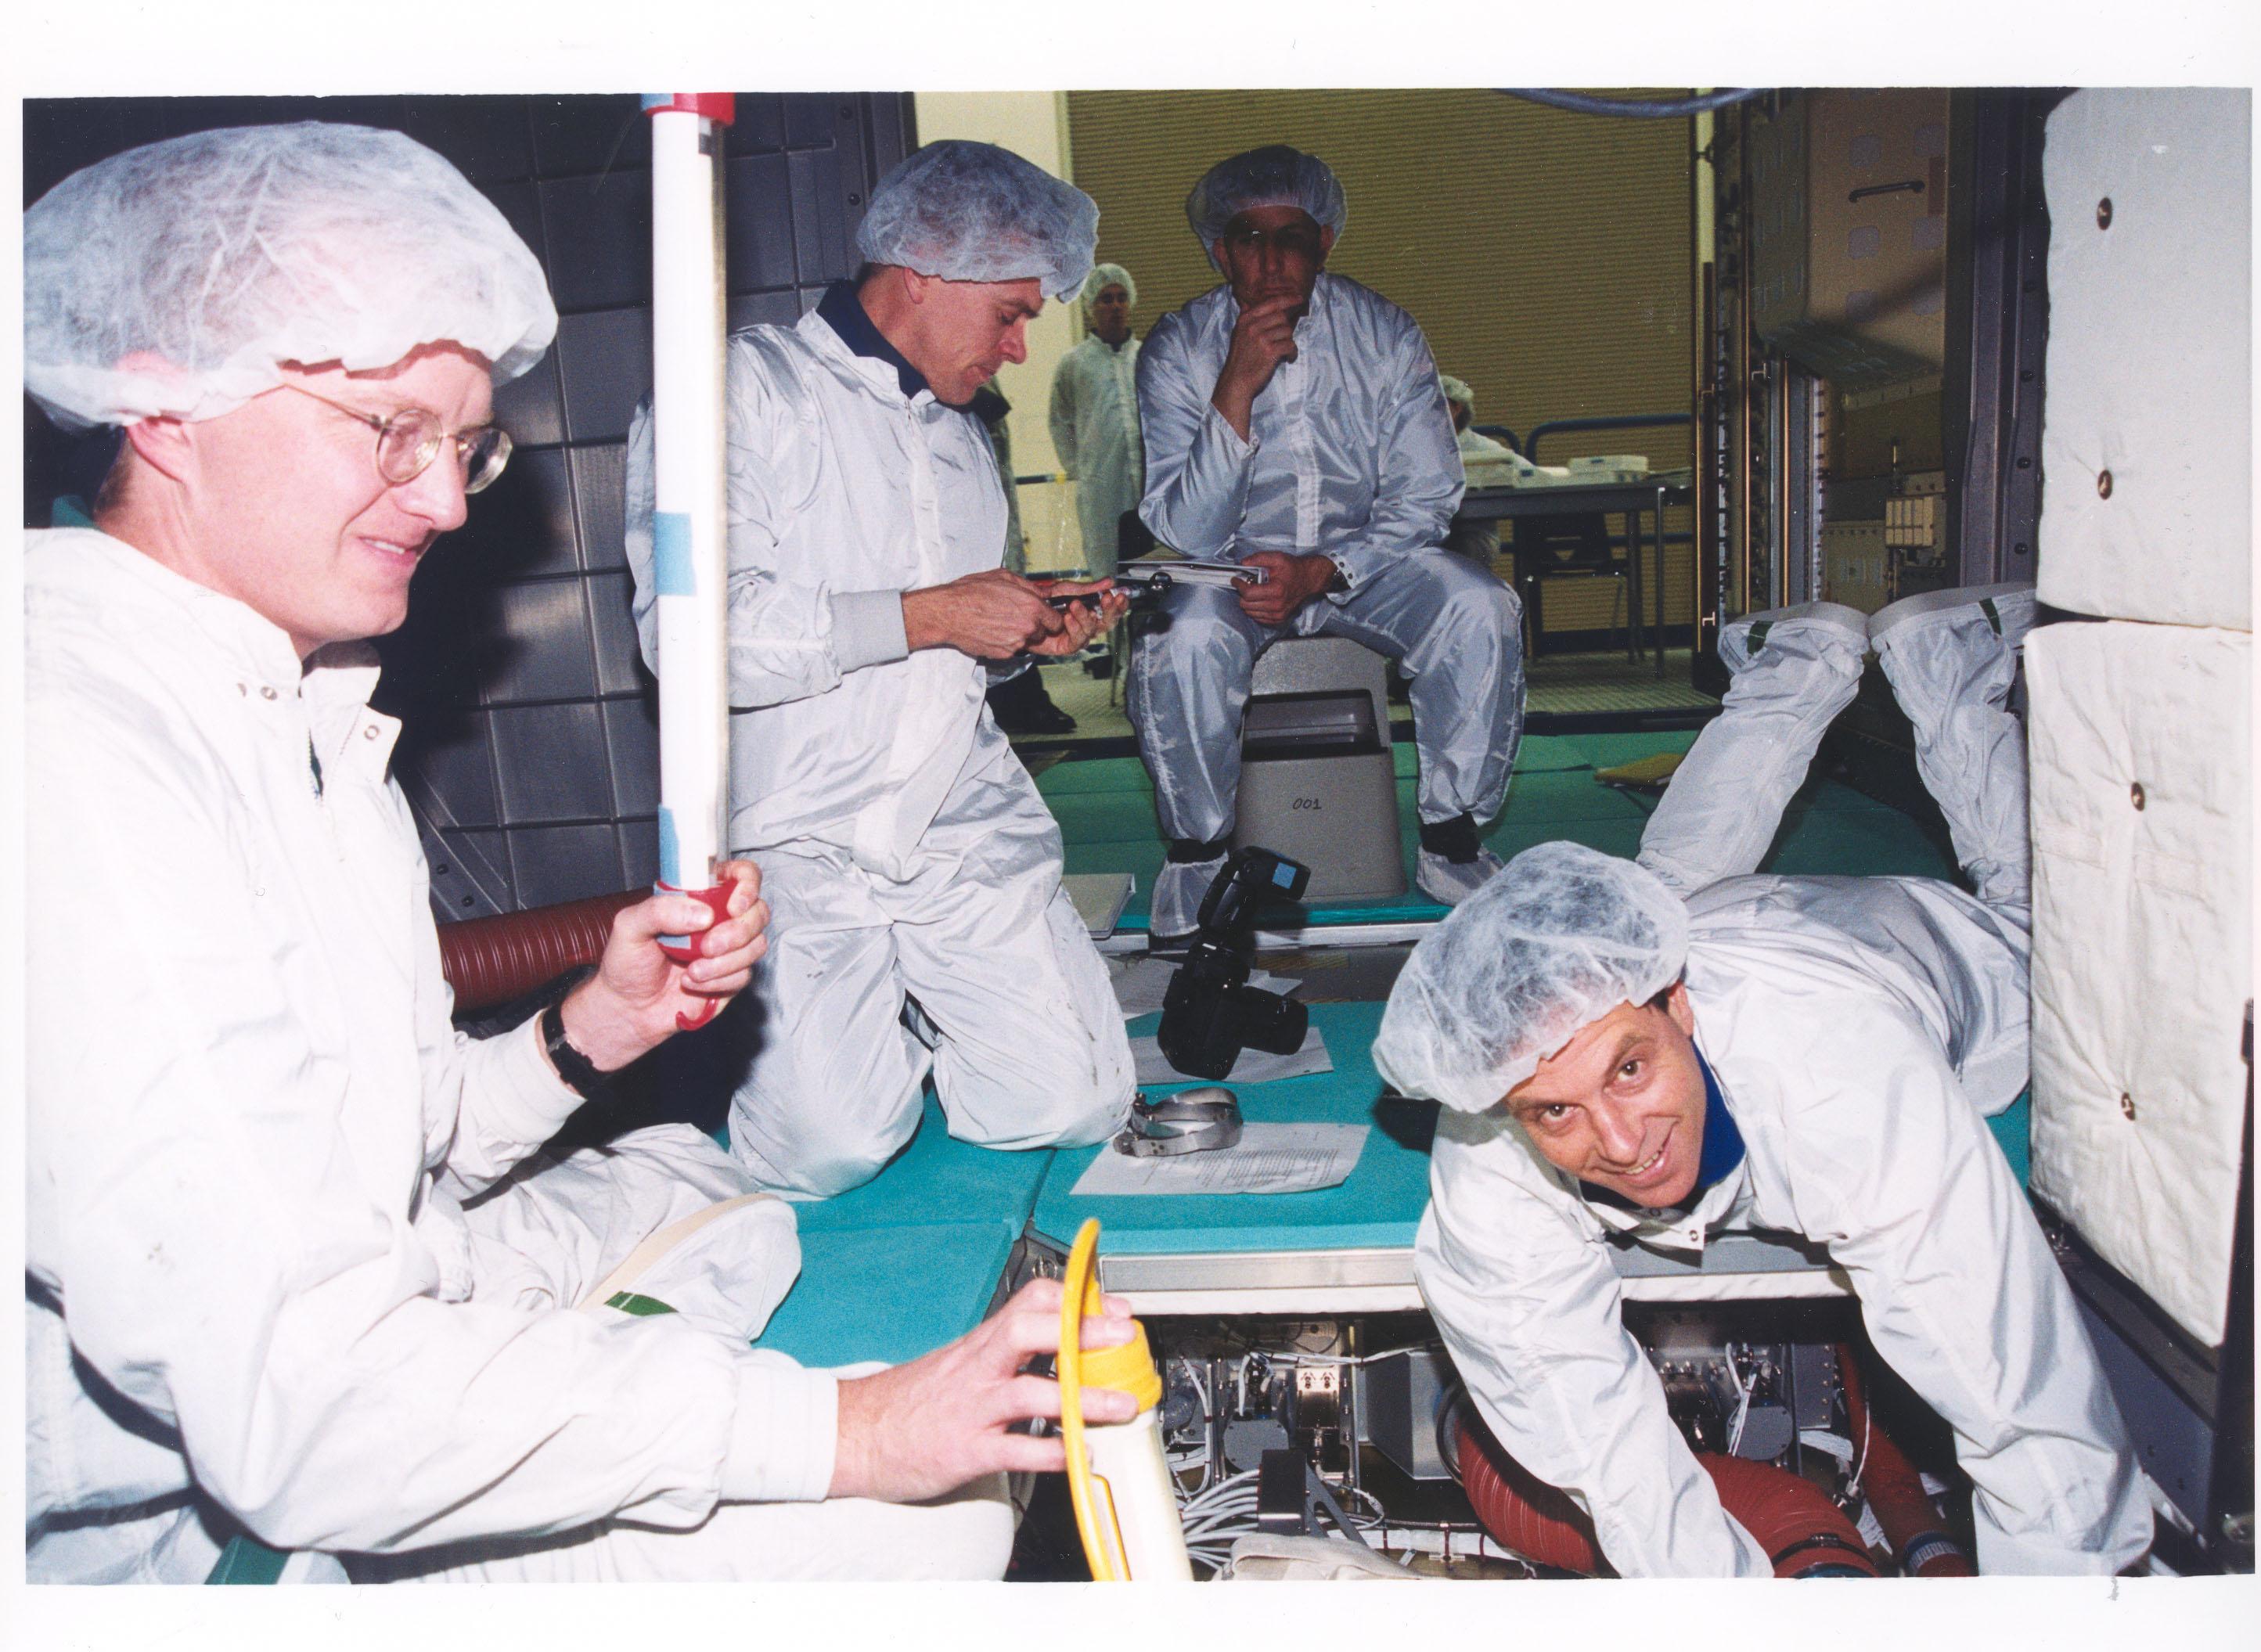 STS-107 In-Flight Maintenance Training